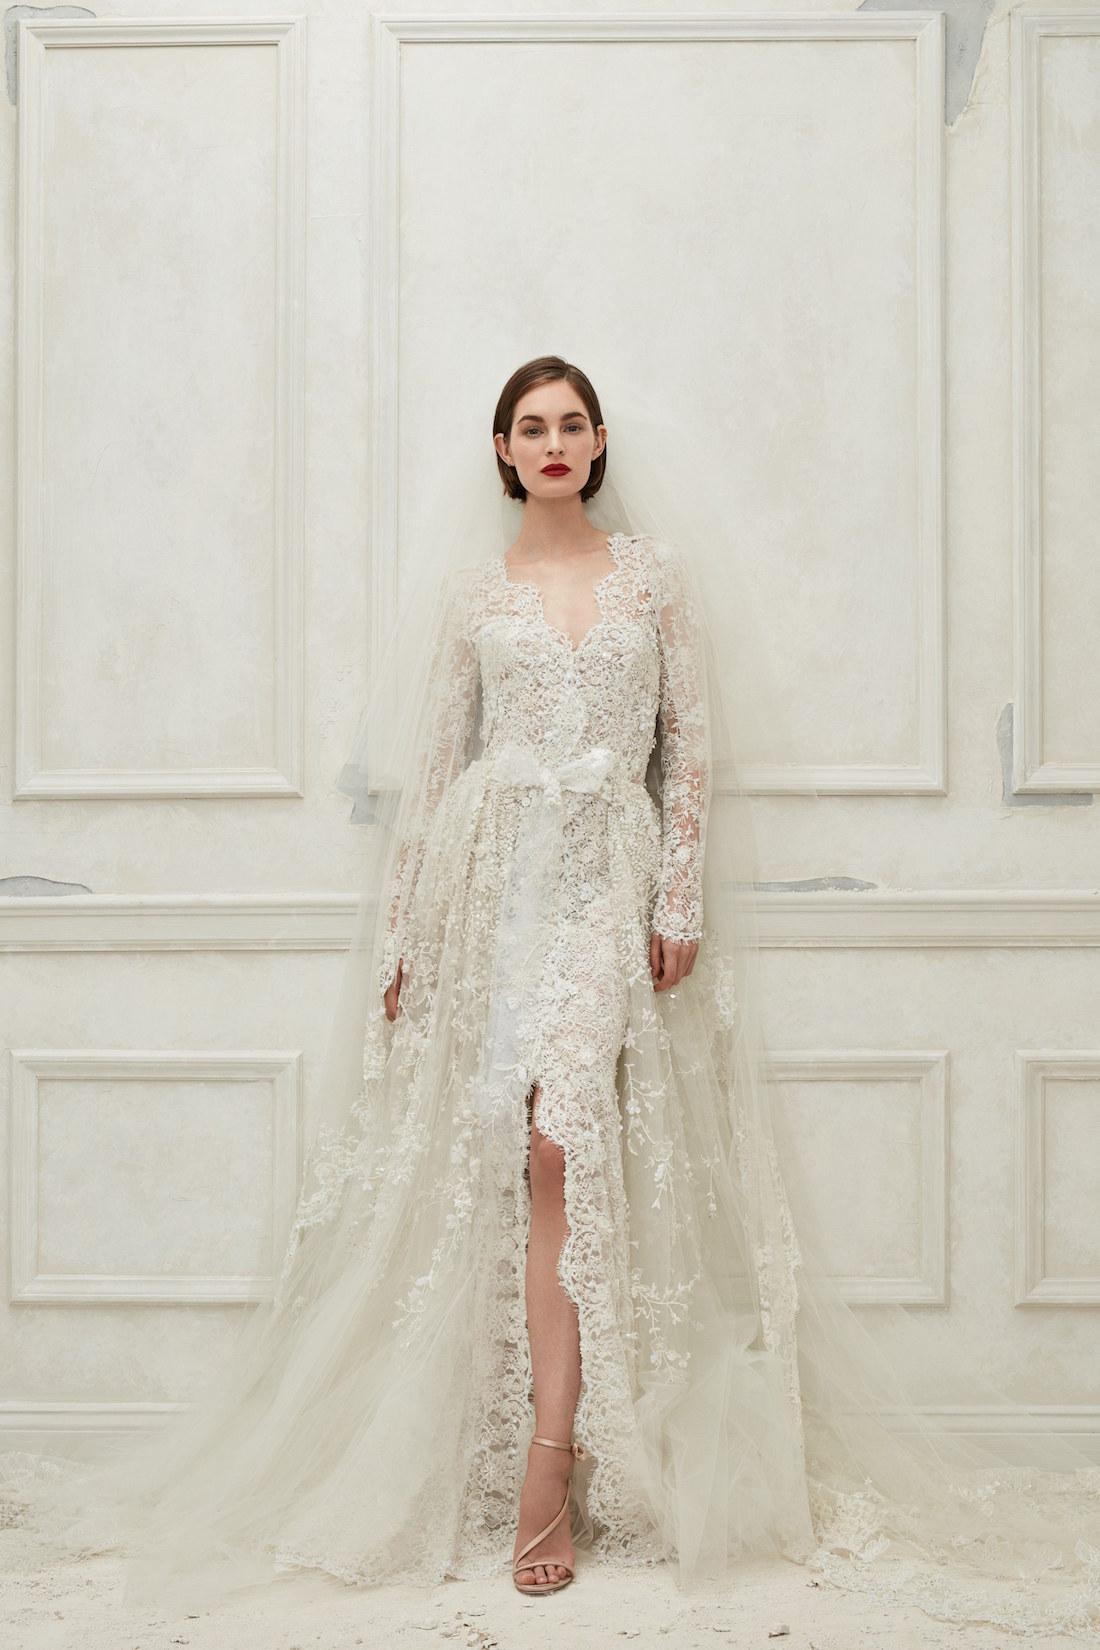 @projectfairytale: Oscar de la Renta Bridal Fall 2019